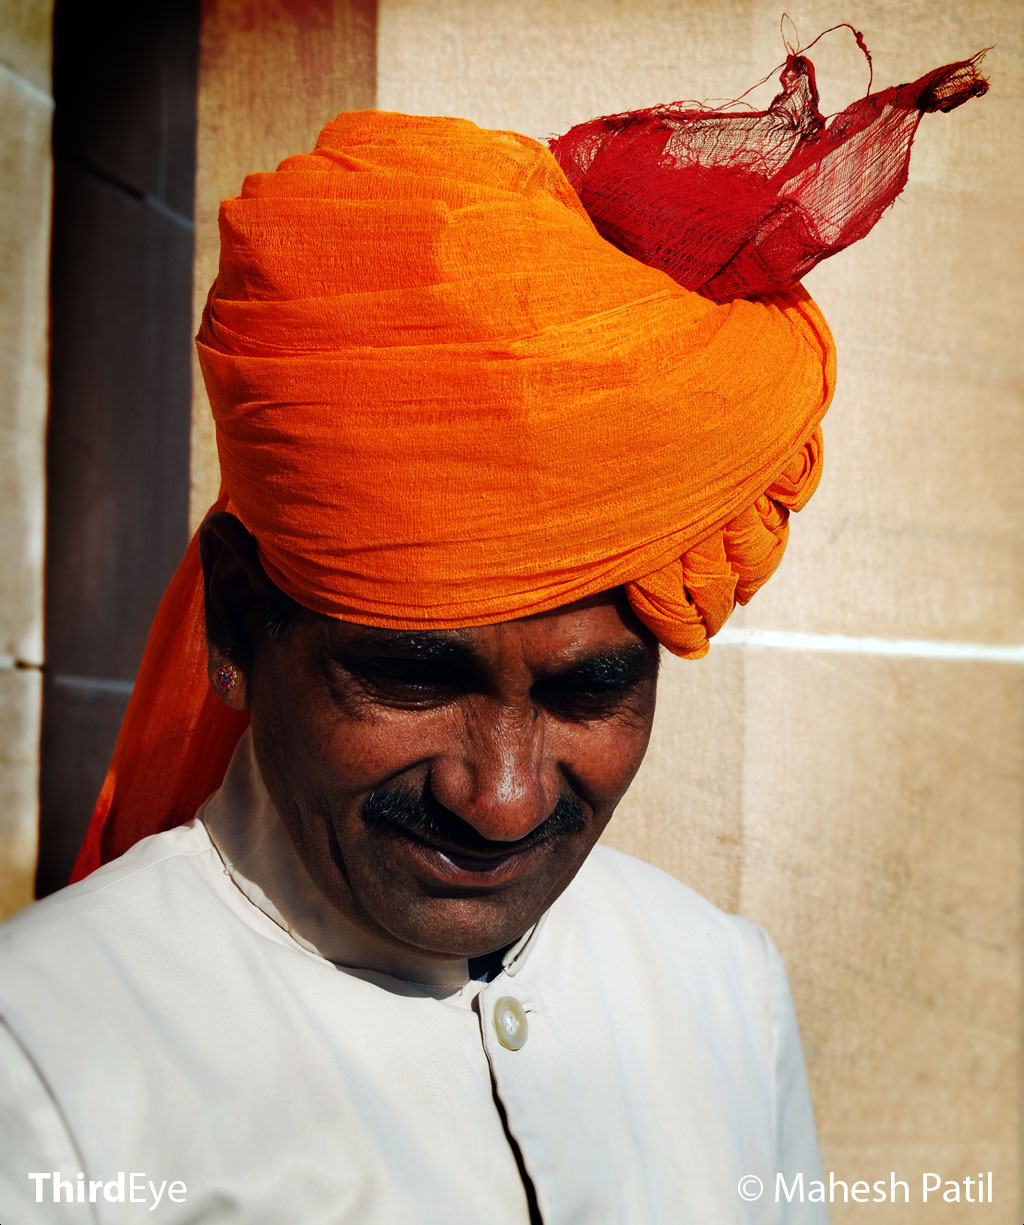 Rajasthan 06: Guard ofUmedbhavan